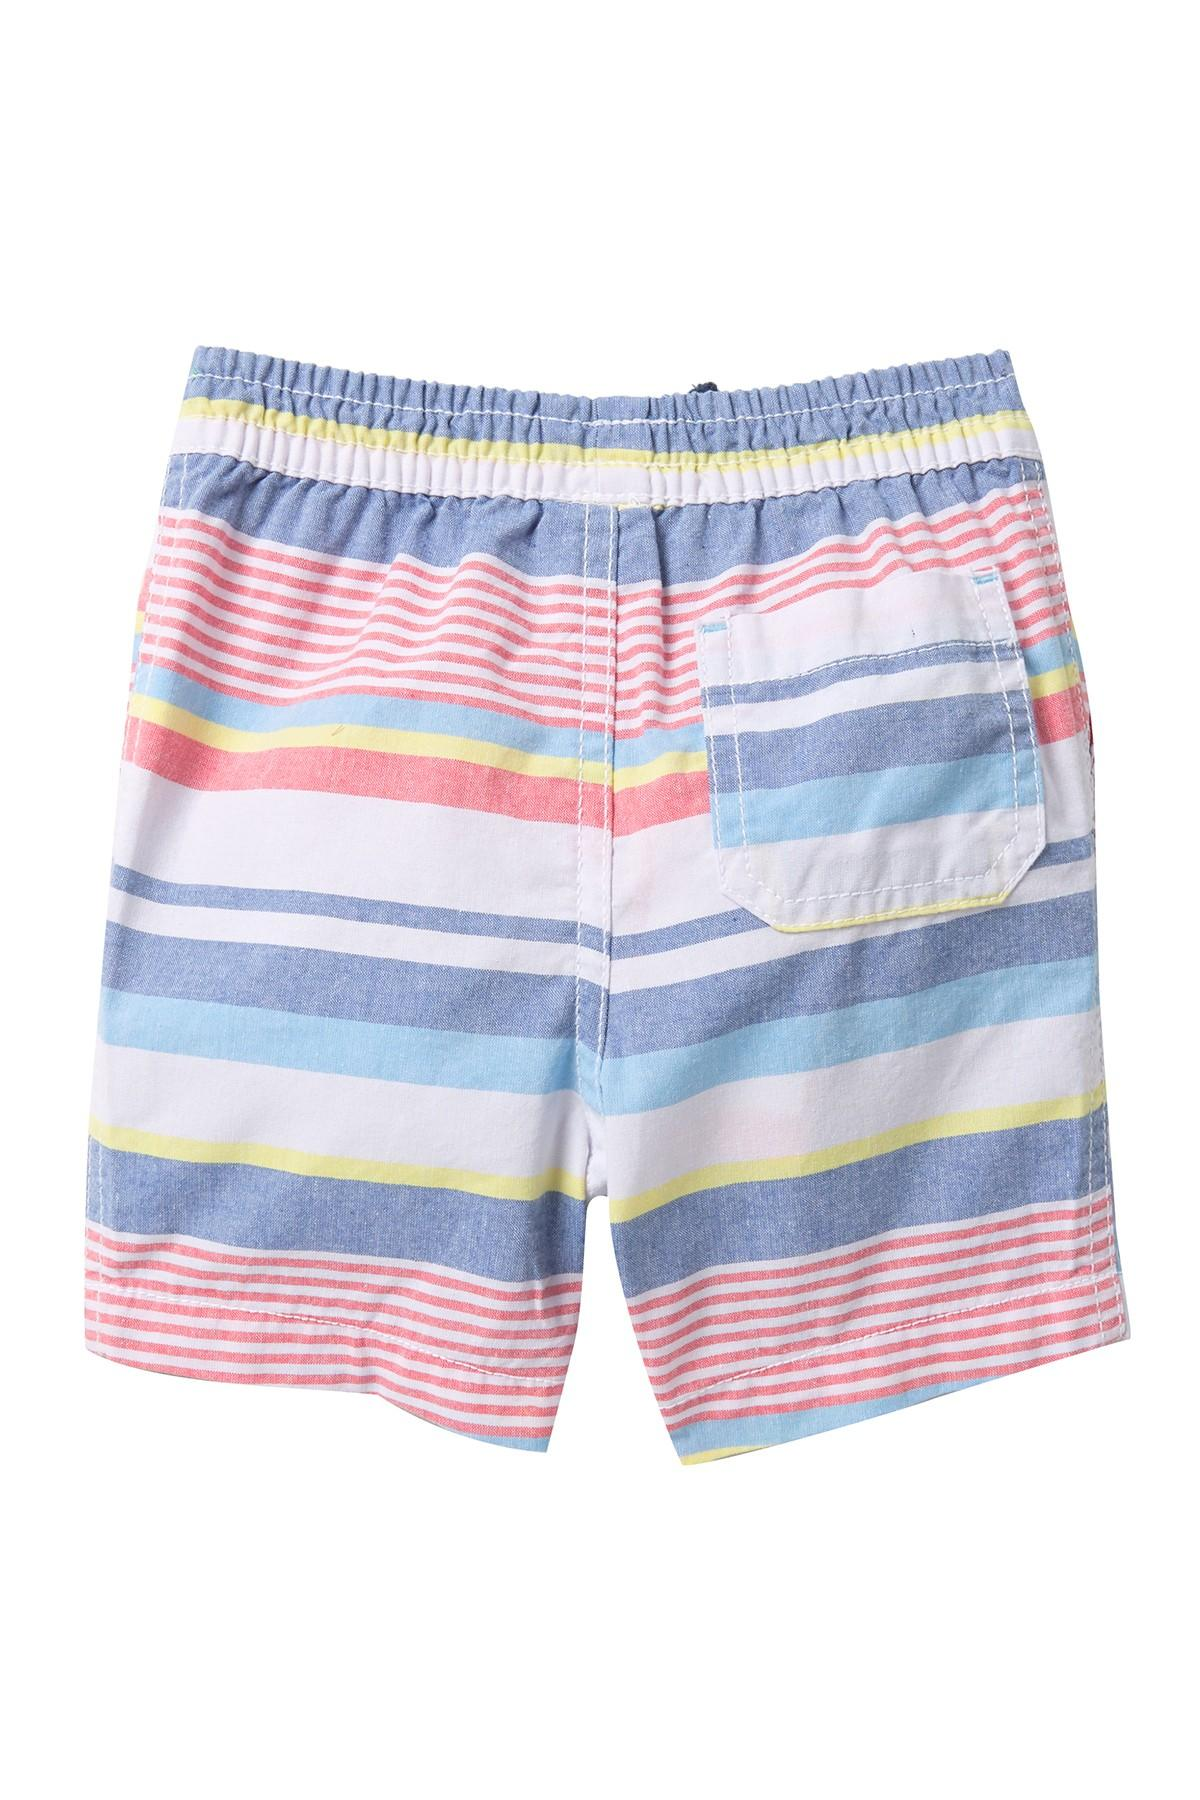 acf26badbb Joe Fresh Striped Shorts (baby Boys) in White for Men - Lyst